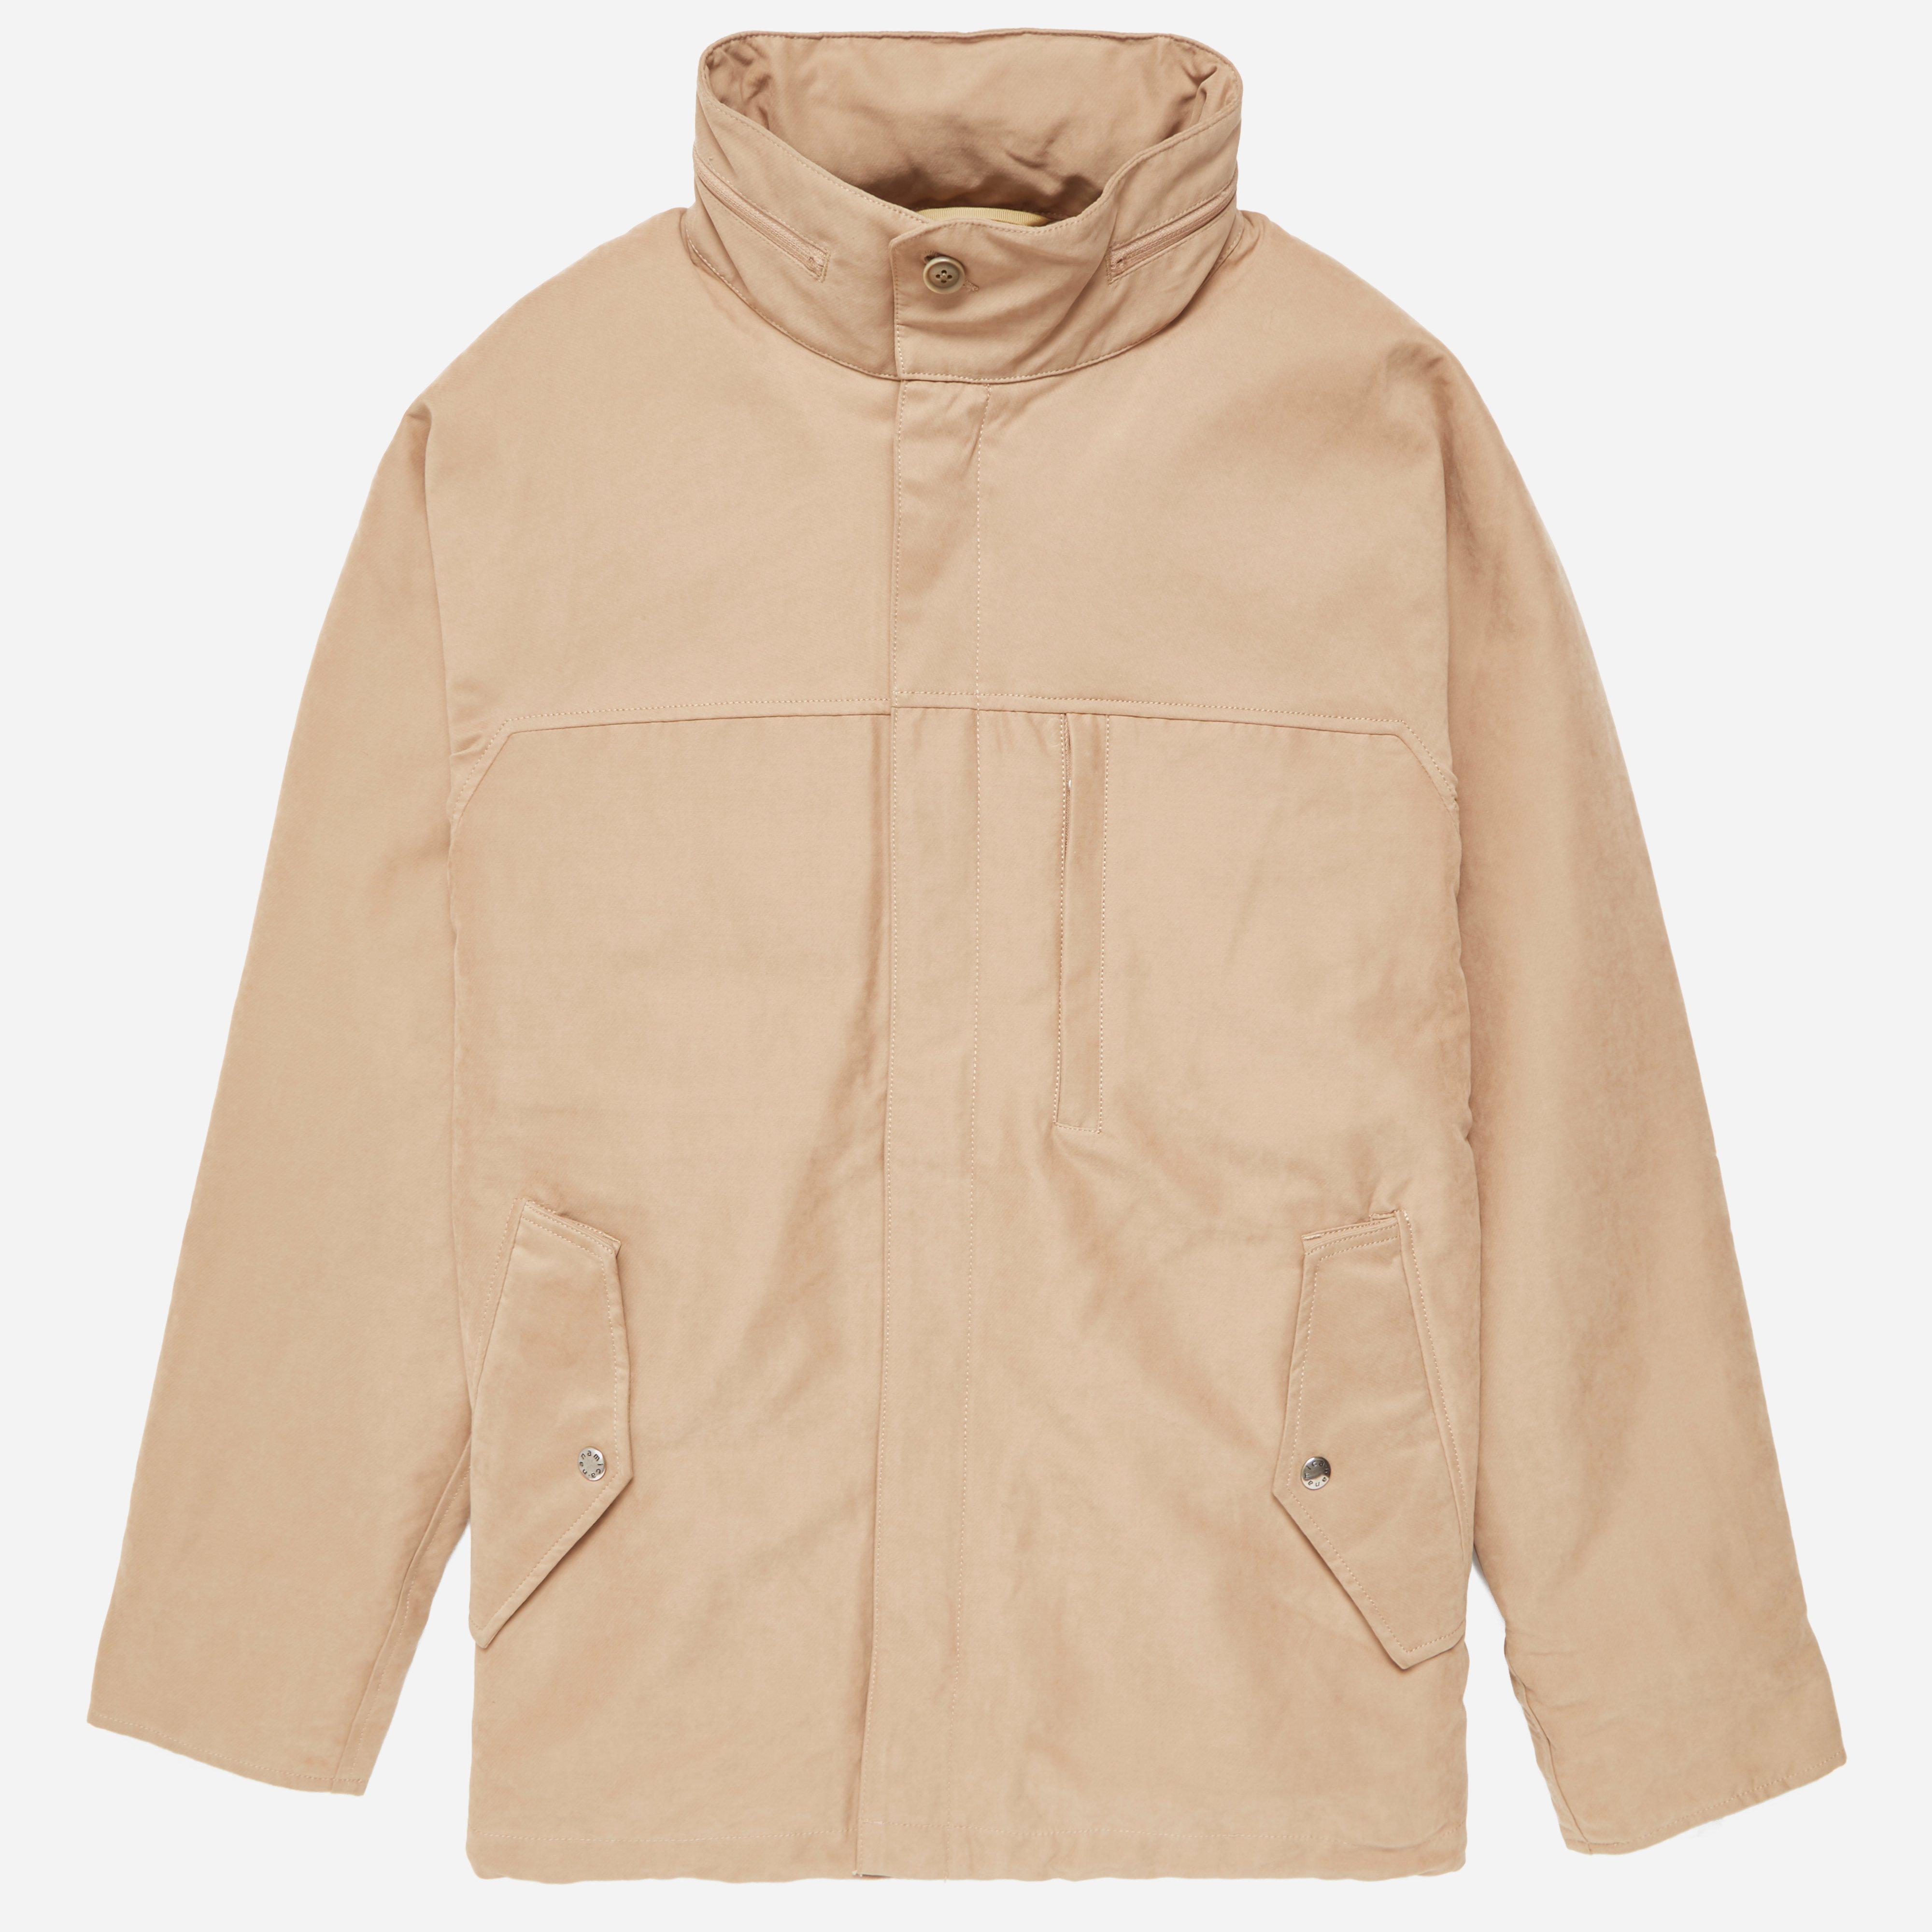 Nanamica Moleskin Down Jacket